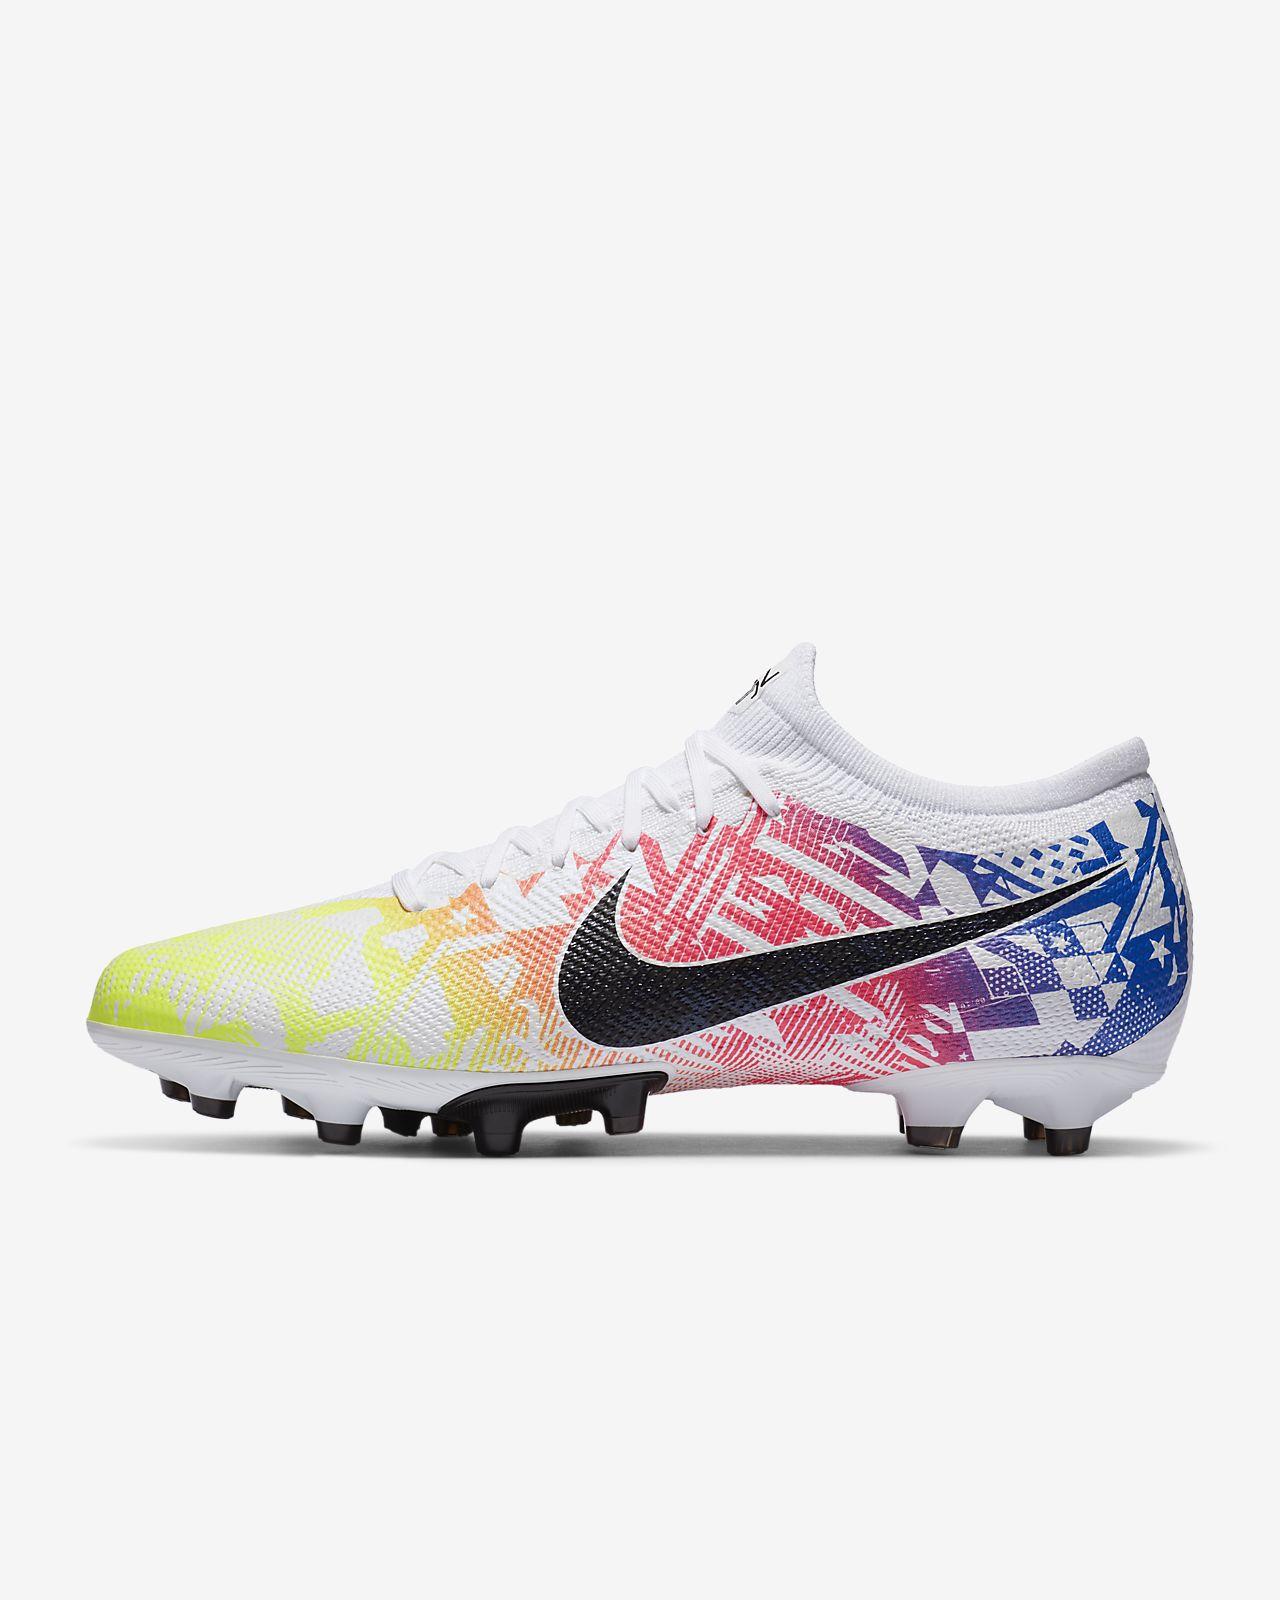 Nike Mercurial Vapor 13 Pro Neymar Jr. AG-PRO Fußballschuh für Kunstrasen